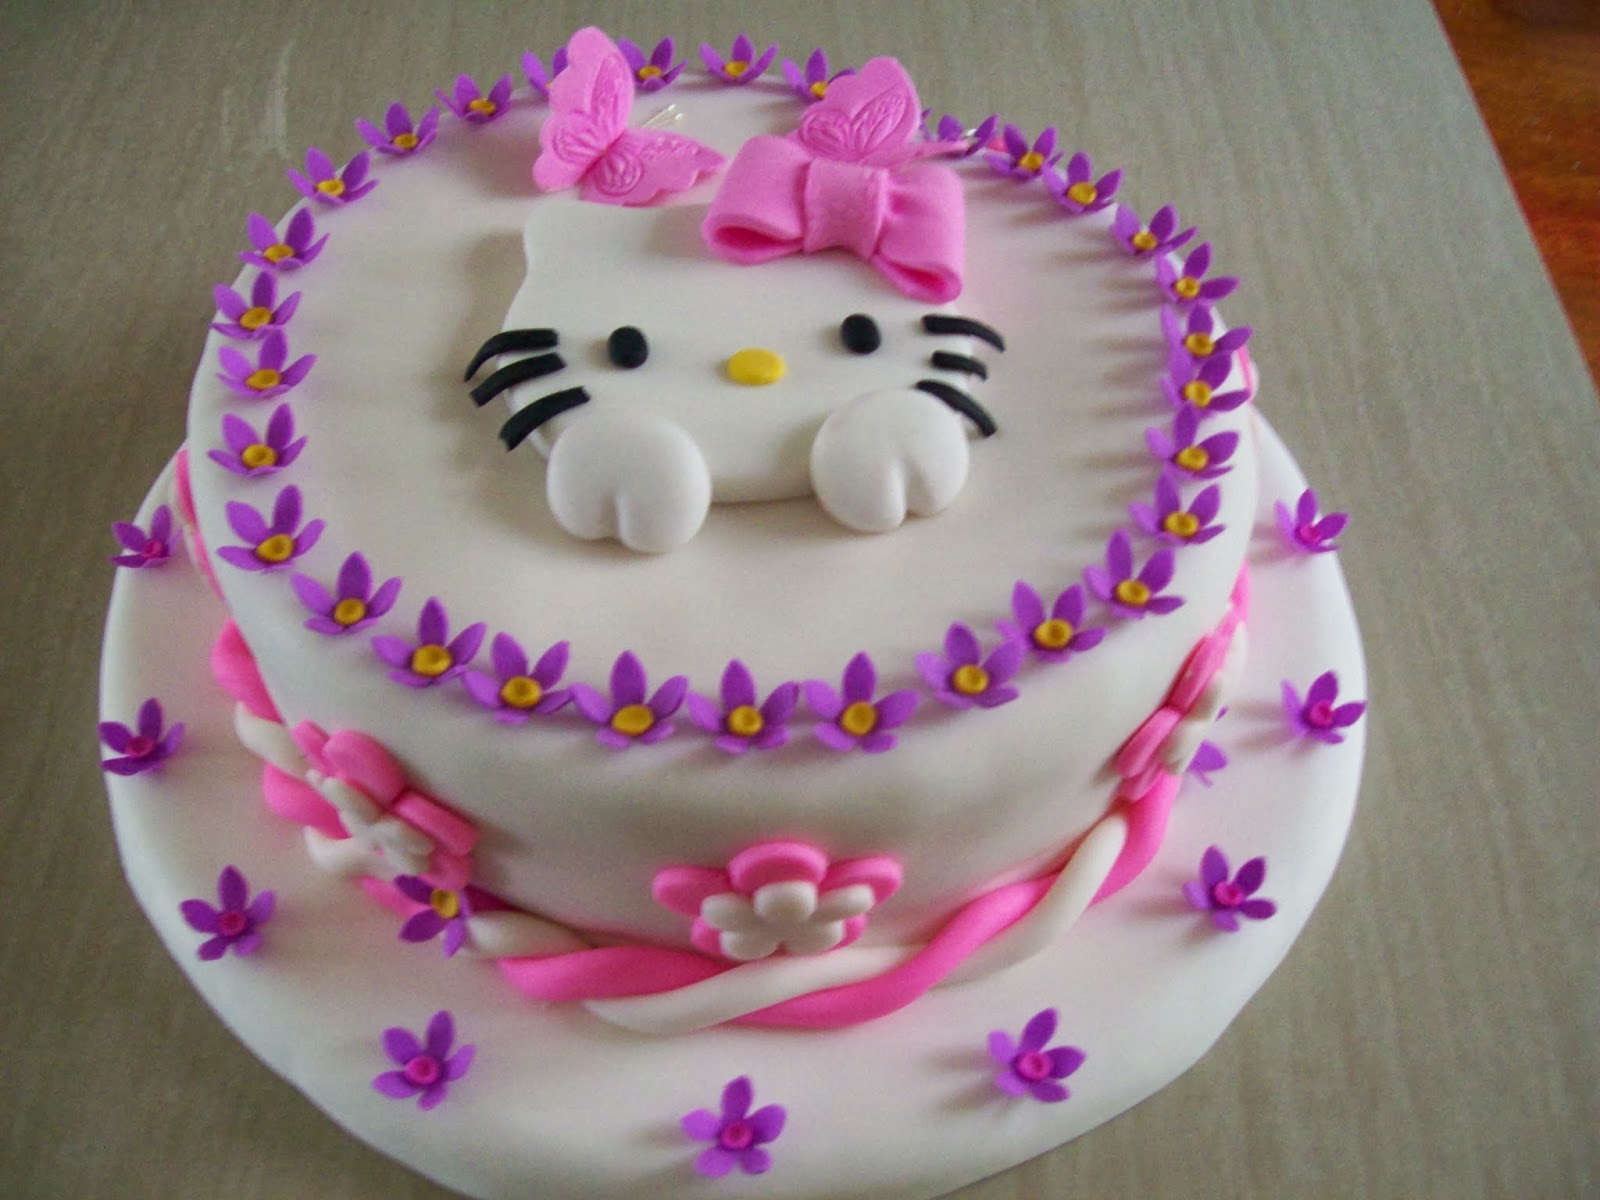 Tortas y Cupcakes Rosi